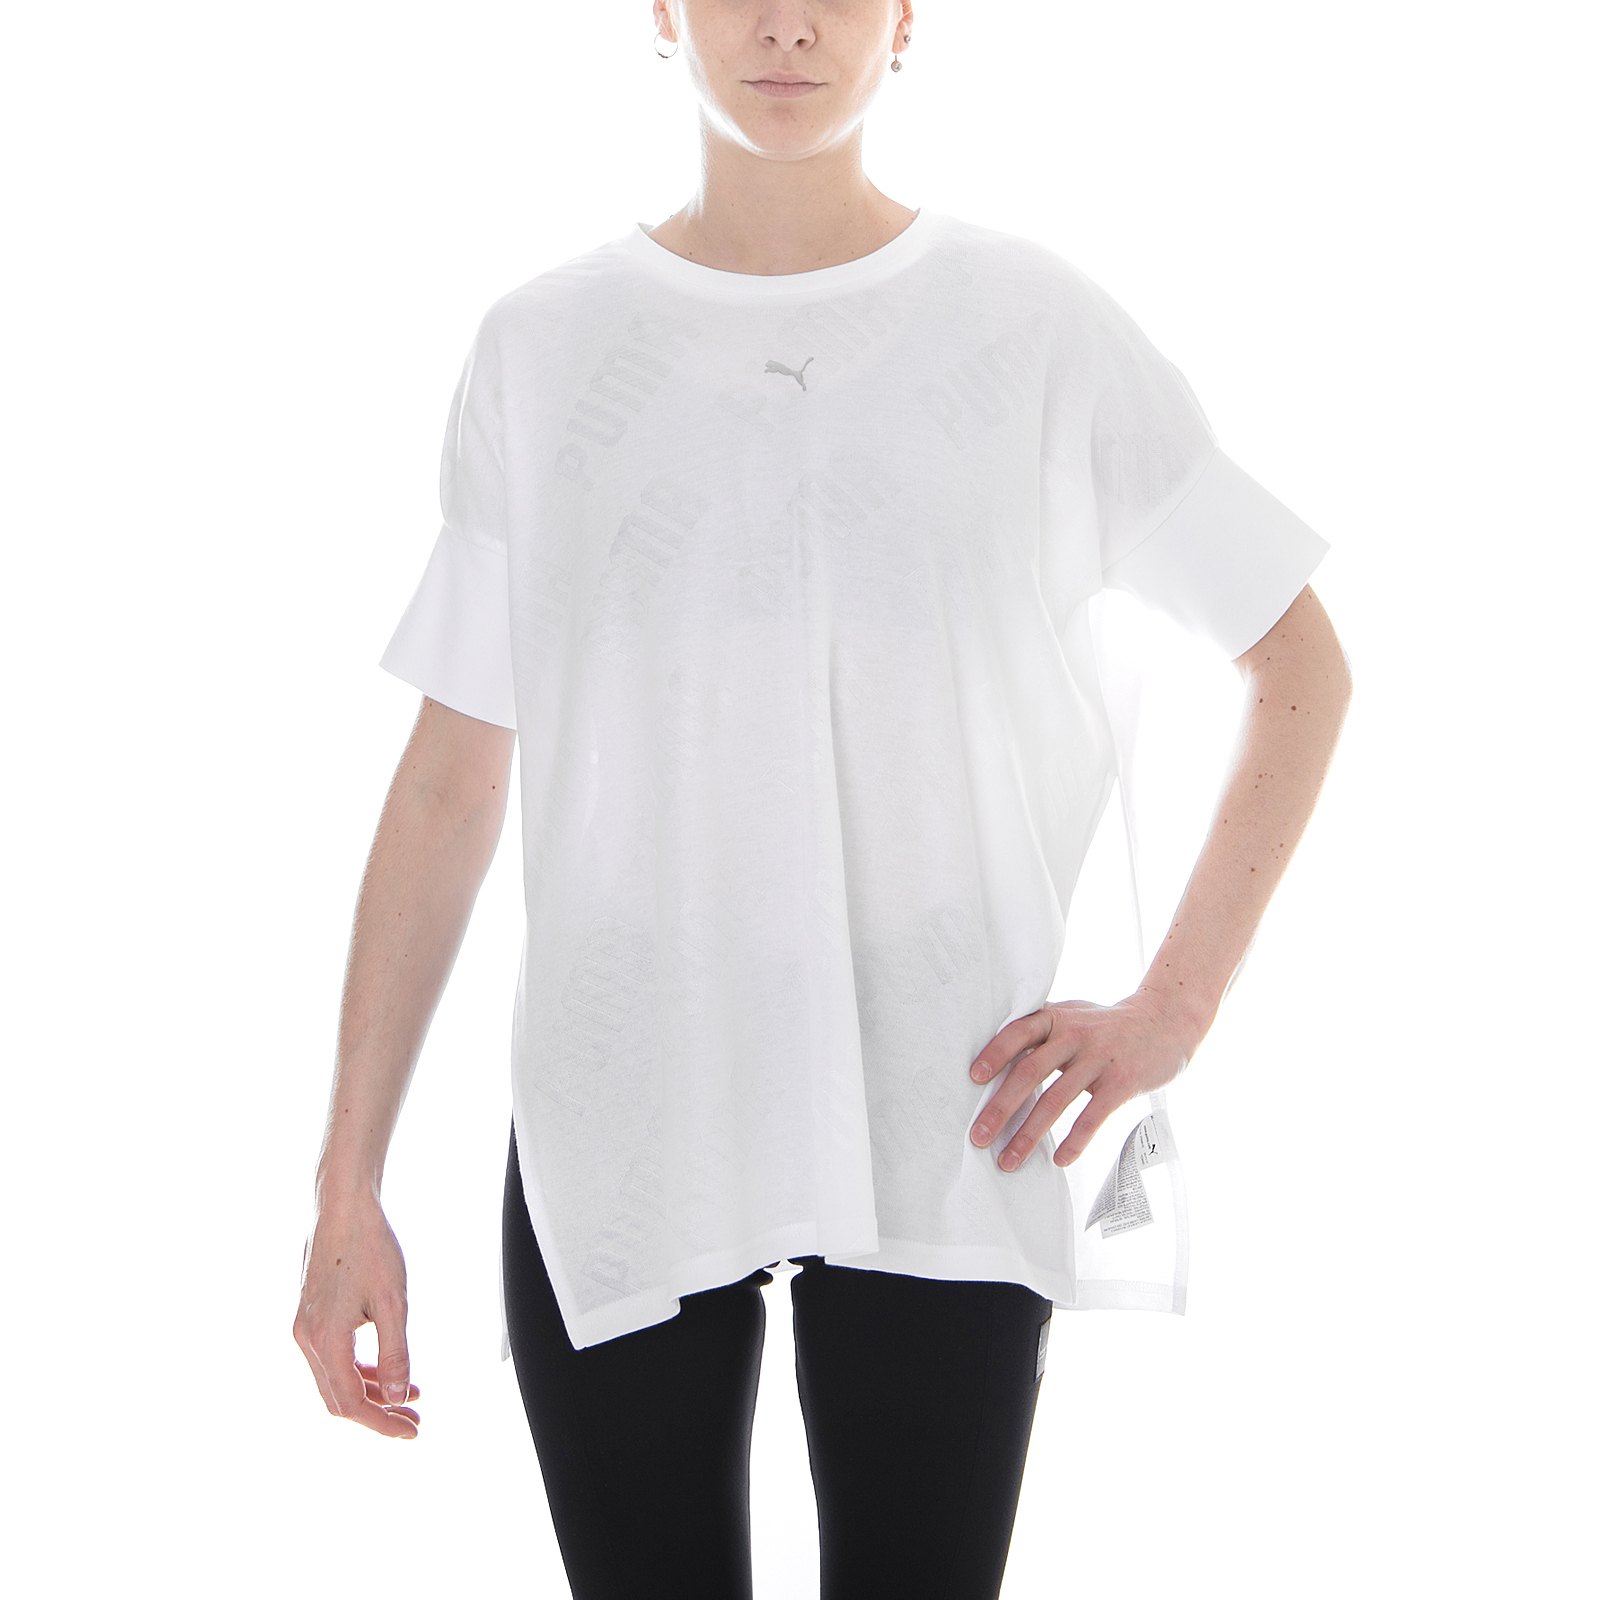 aec396eec810ca PUMA En Pointe Wide Women s T-shirt White 40 for sale online